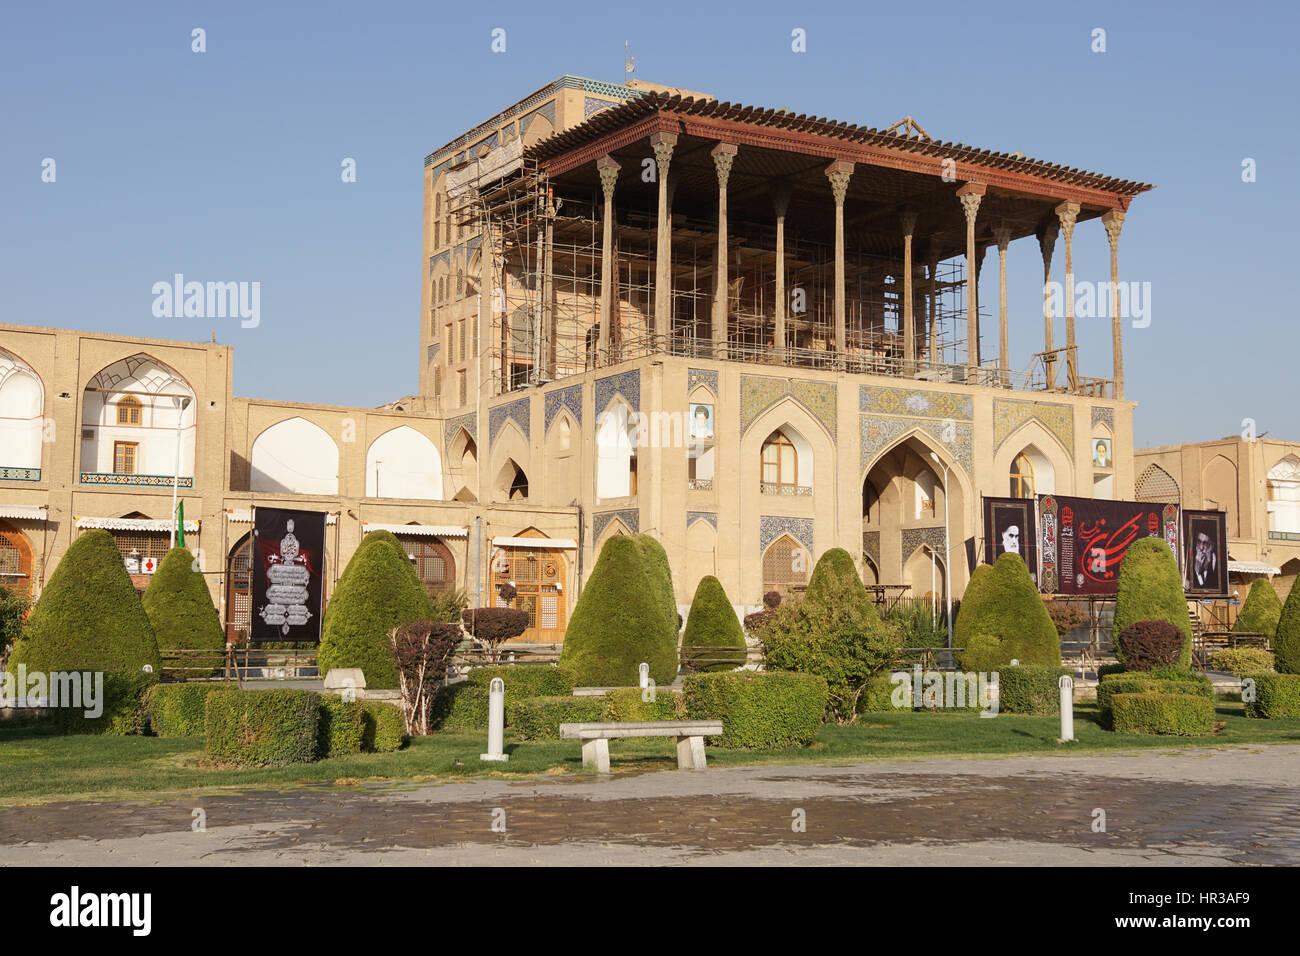 ISFAHAN, IRAN - OCTOBER 11, 2016: Ali Qapu Palace on Meydan-e Imam on October 11, 2016 in Isfahan, Iran. Stock Photo